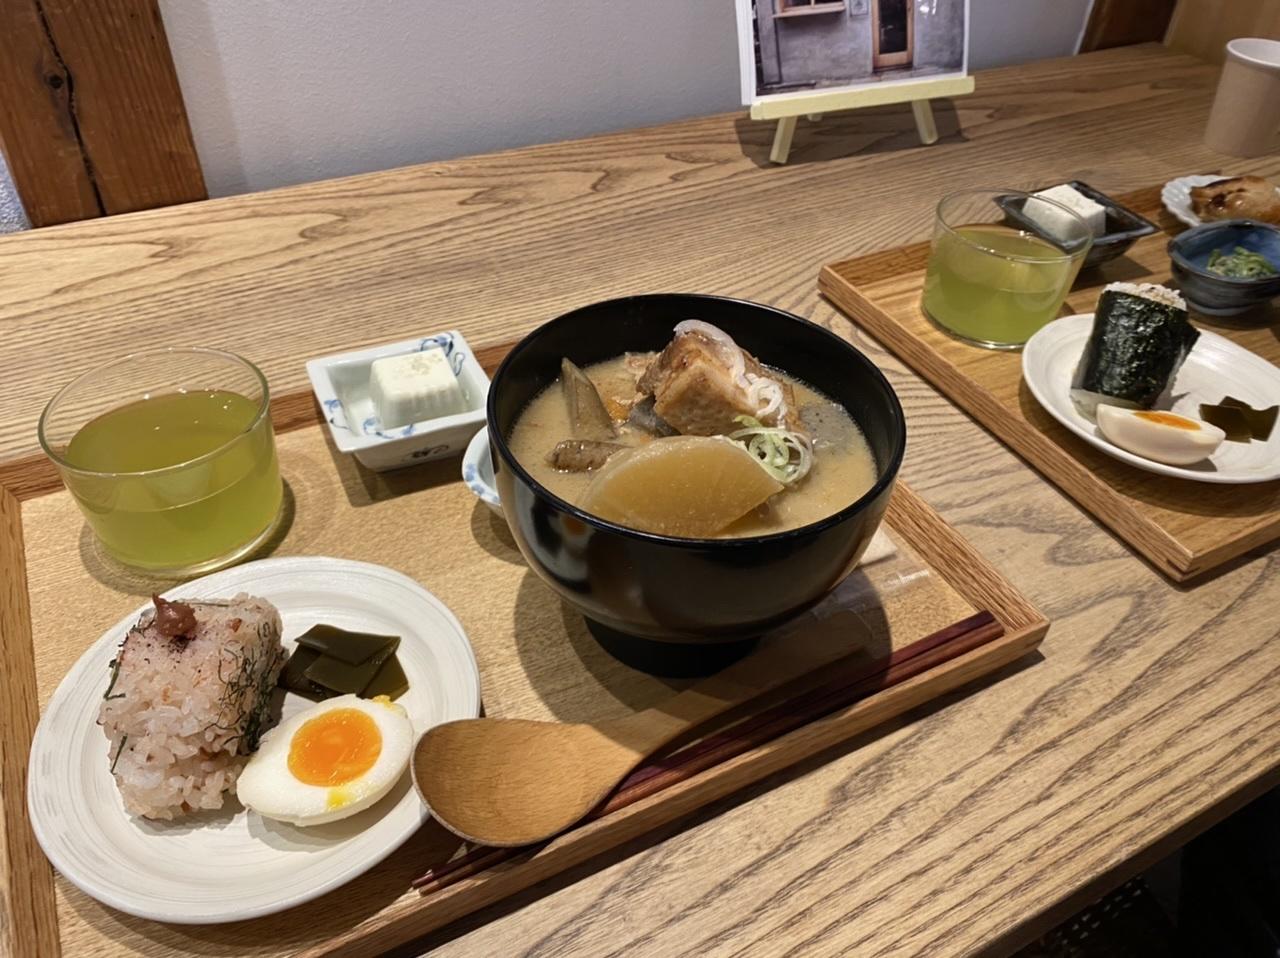 【浅草】お味噌汁専門店☀︎_1_4